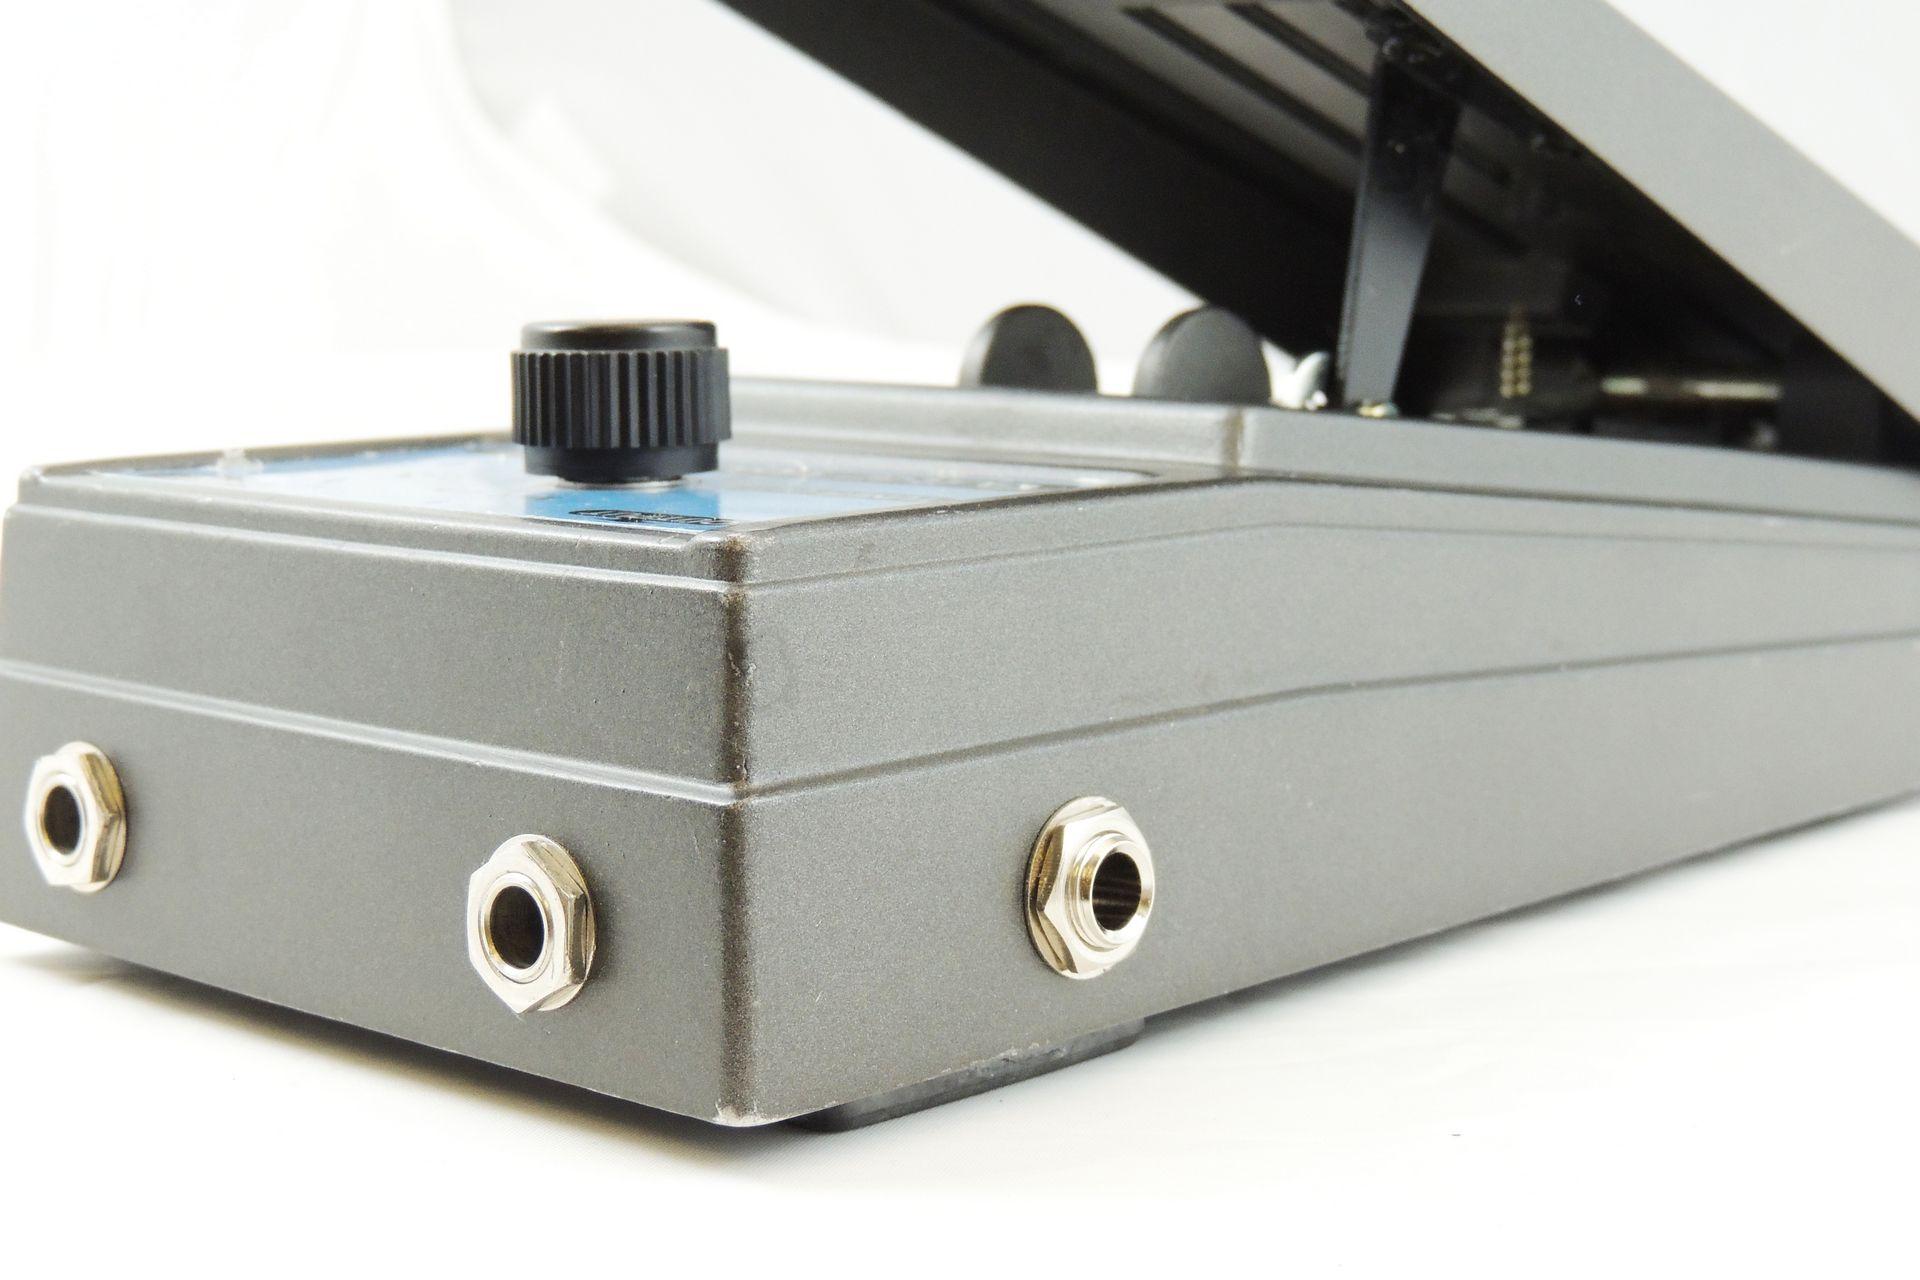 Boss FV-100 volume pedal for sale at Plasma Music